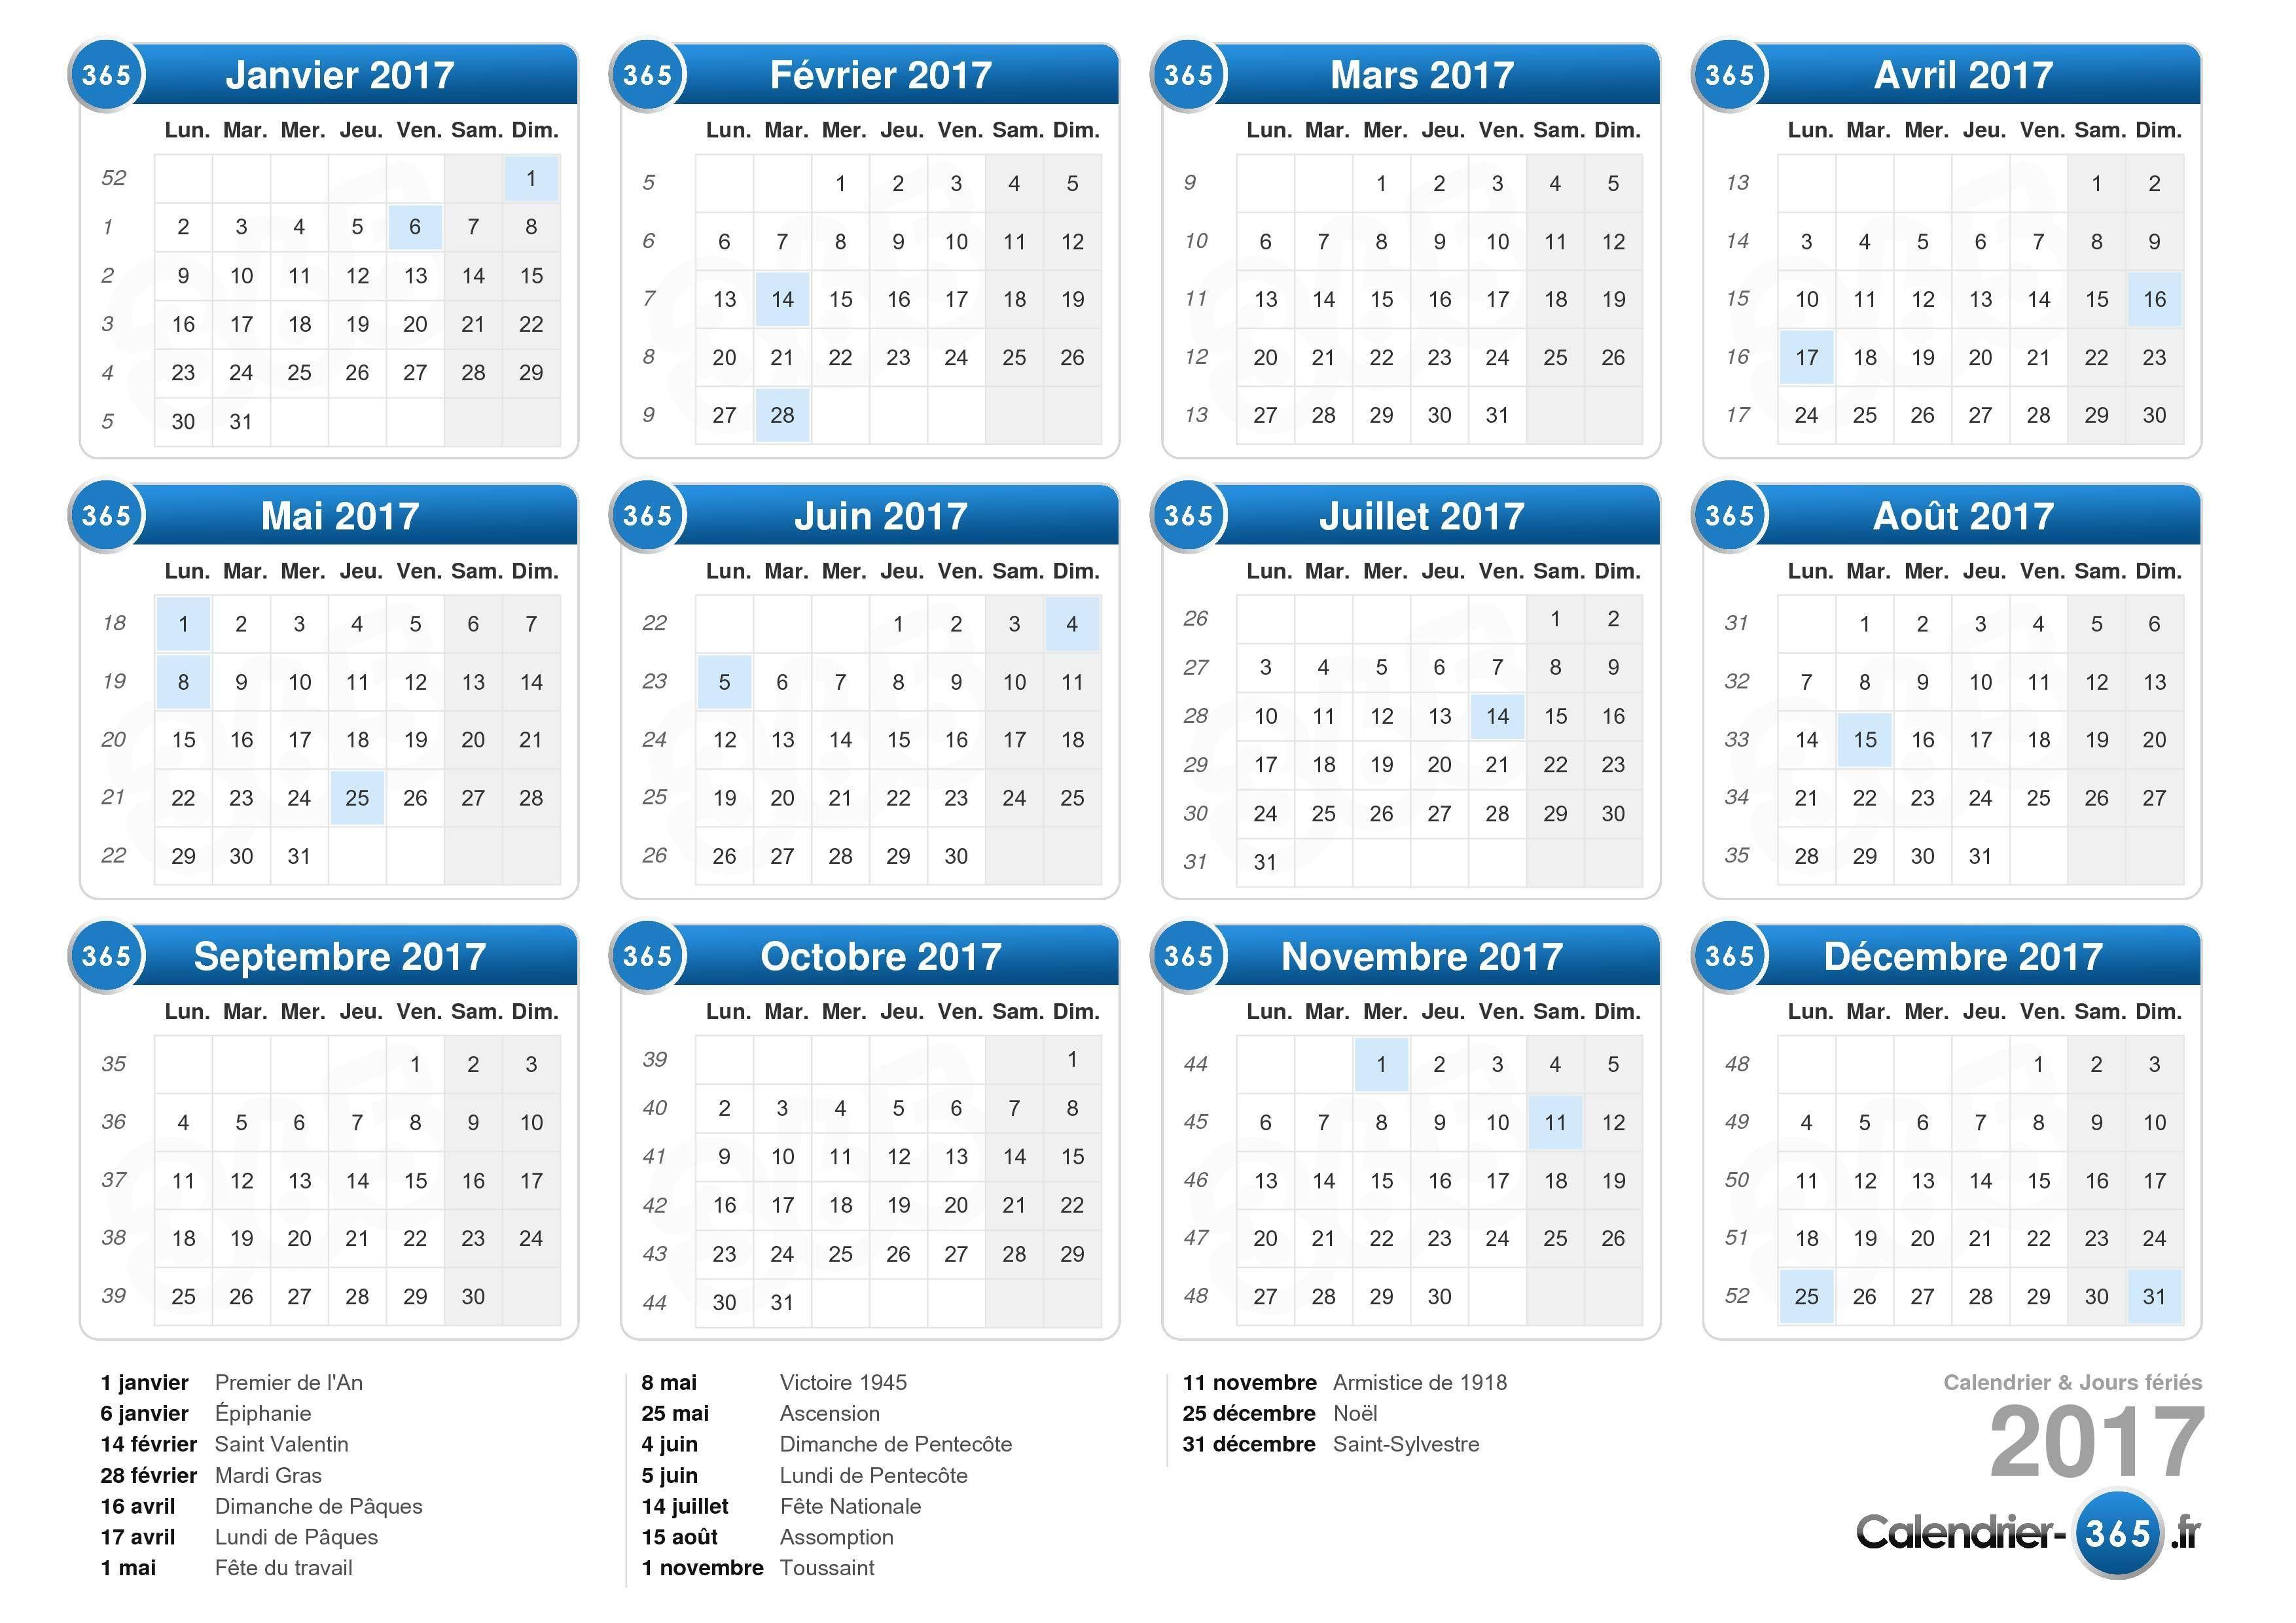 Calendrier 2017 | Календарь Для Печати, Шаблоны Календарей И intended for Calendario Zbinden 2020